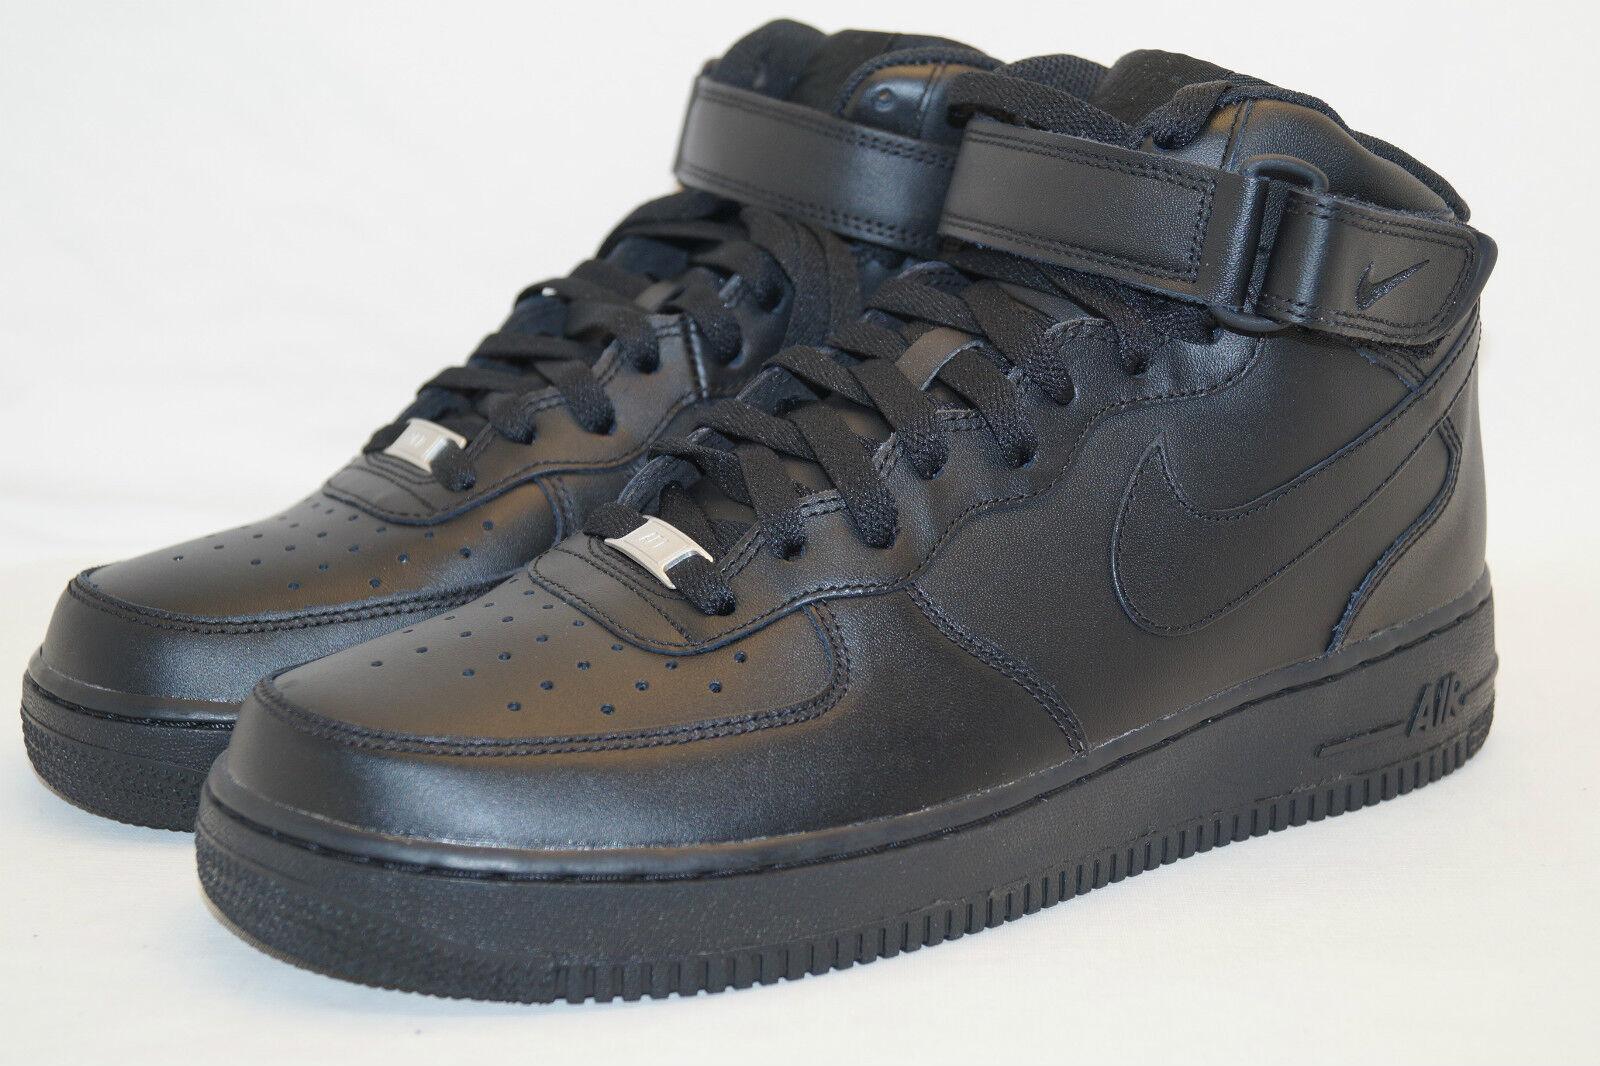 Nike Air Force 1 AF - 1 a mediados de 2007 gr.45 UK 10 negro monocromatografía